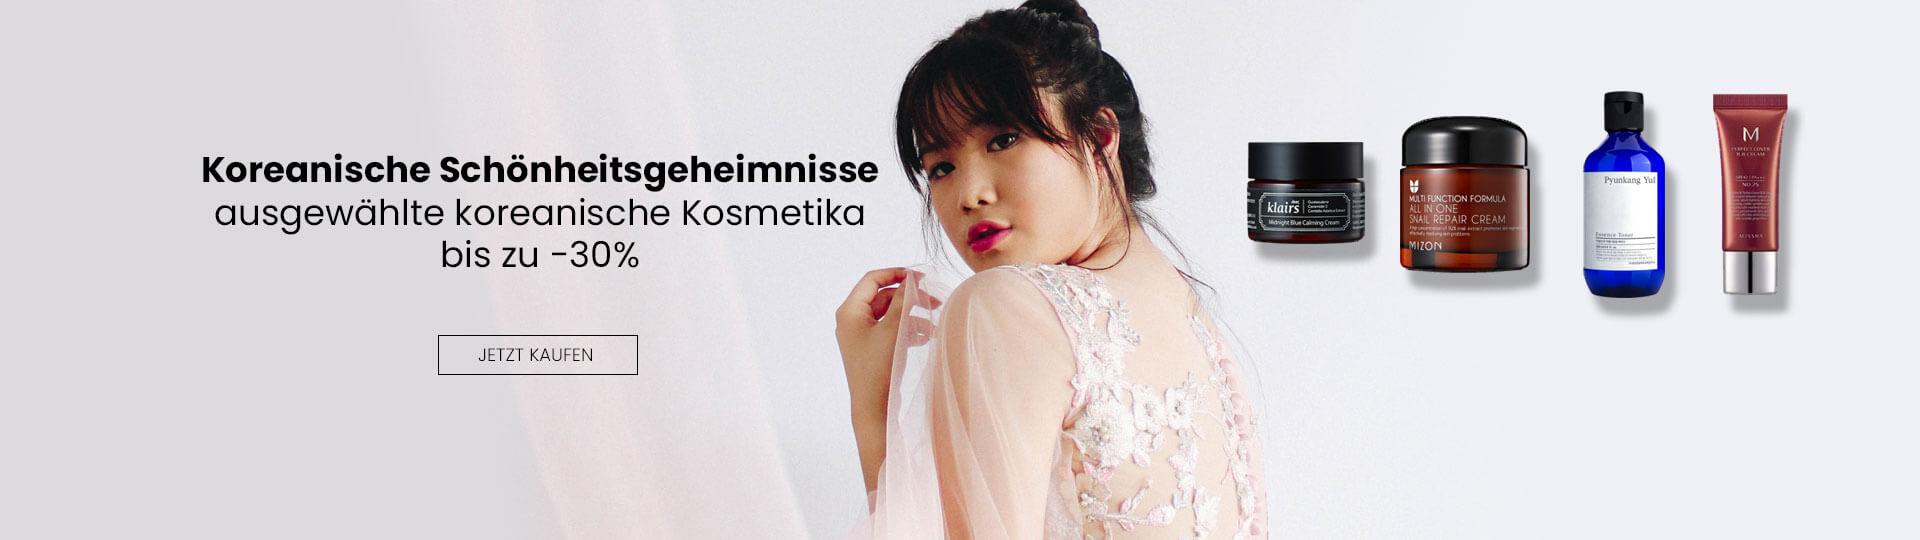 Asiatische Kosmetik